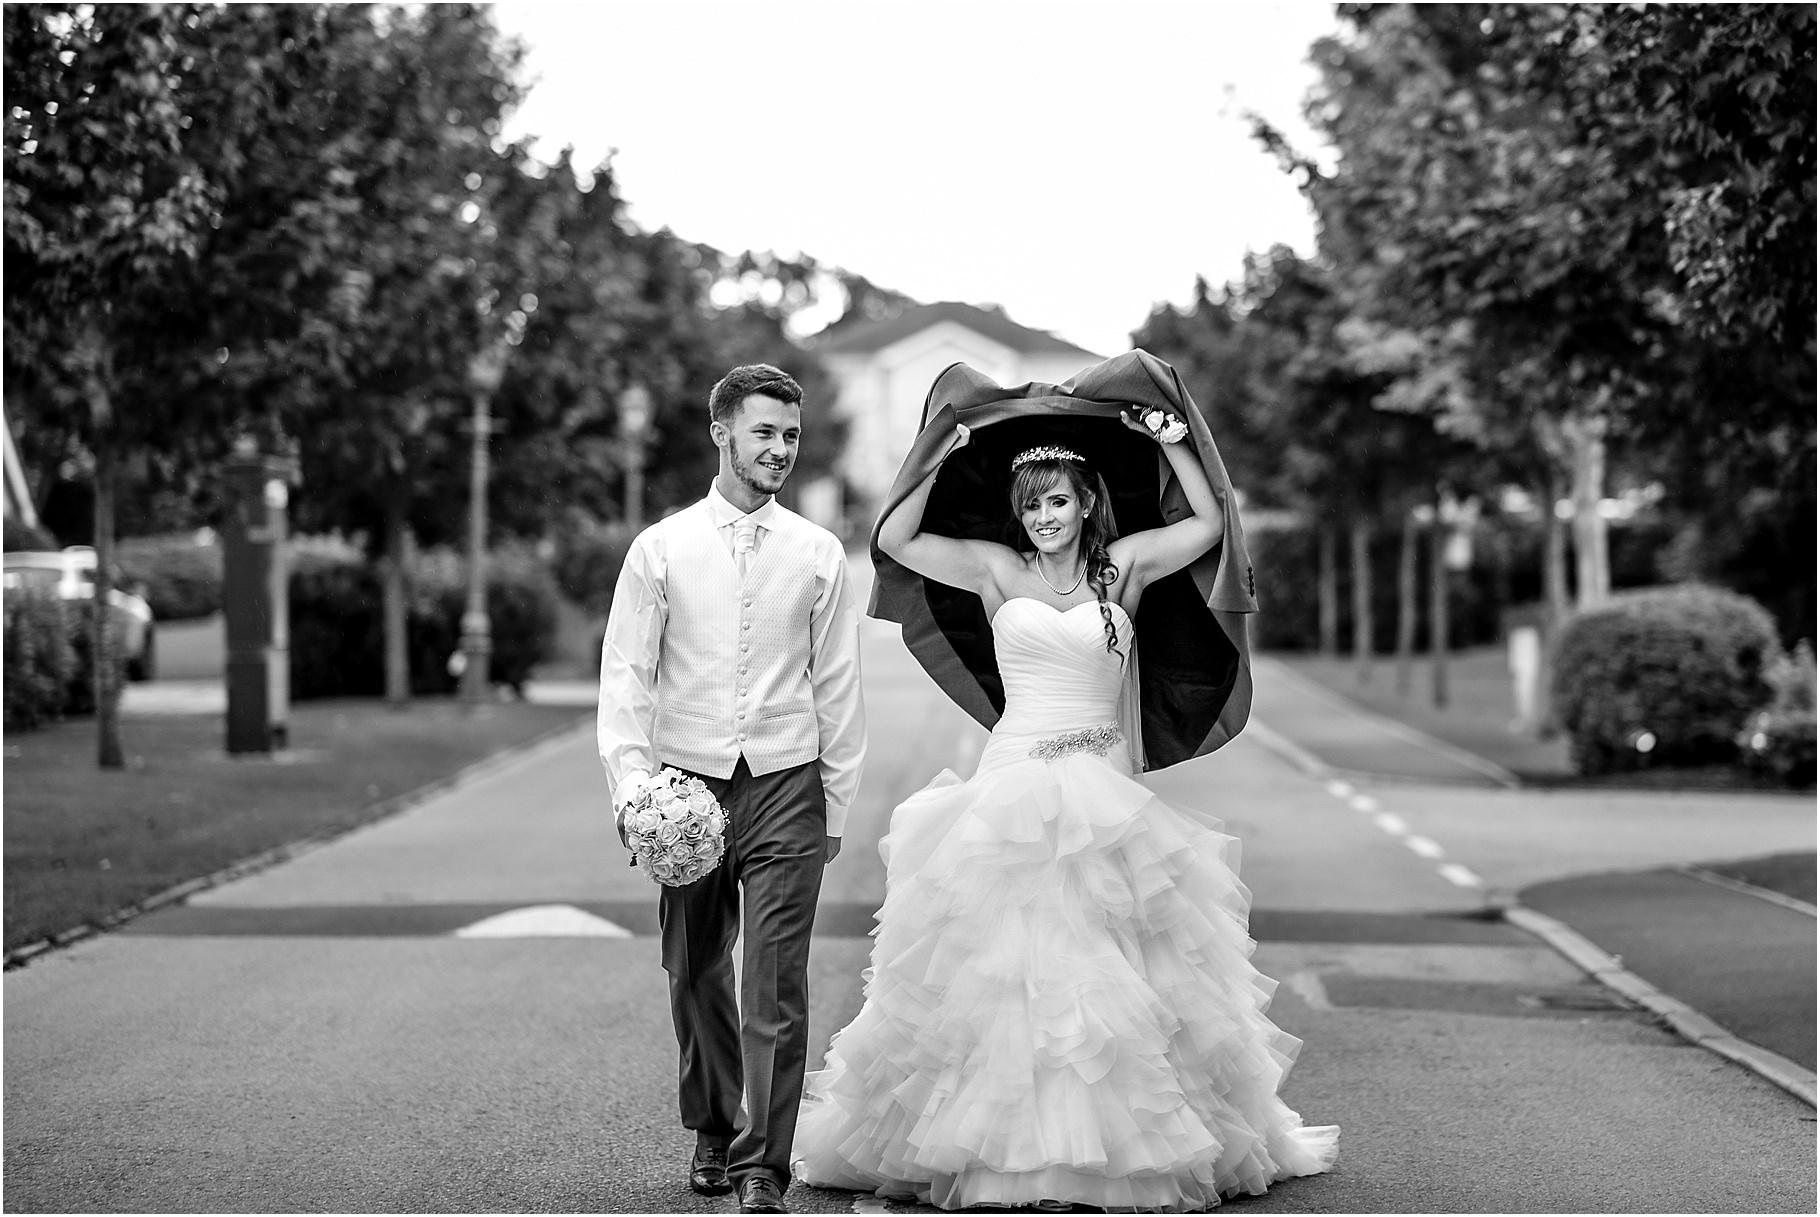 dan-wootton-photography-2017-weddings-197.jpg